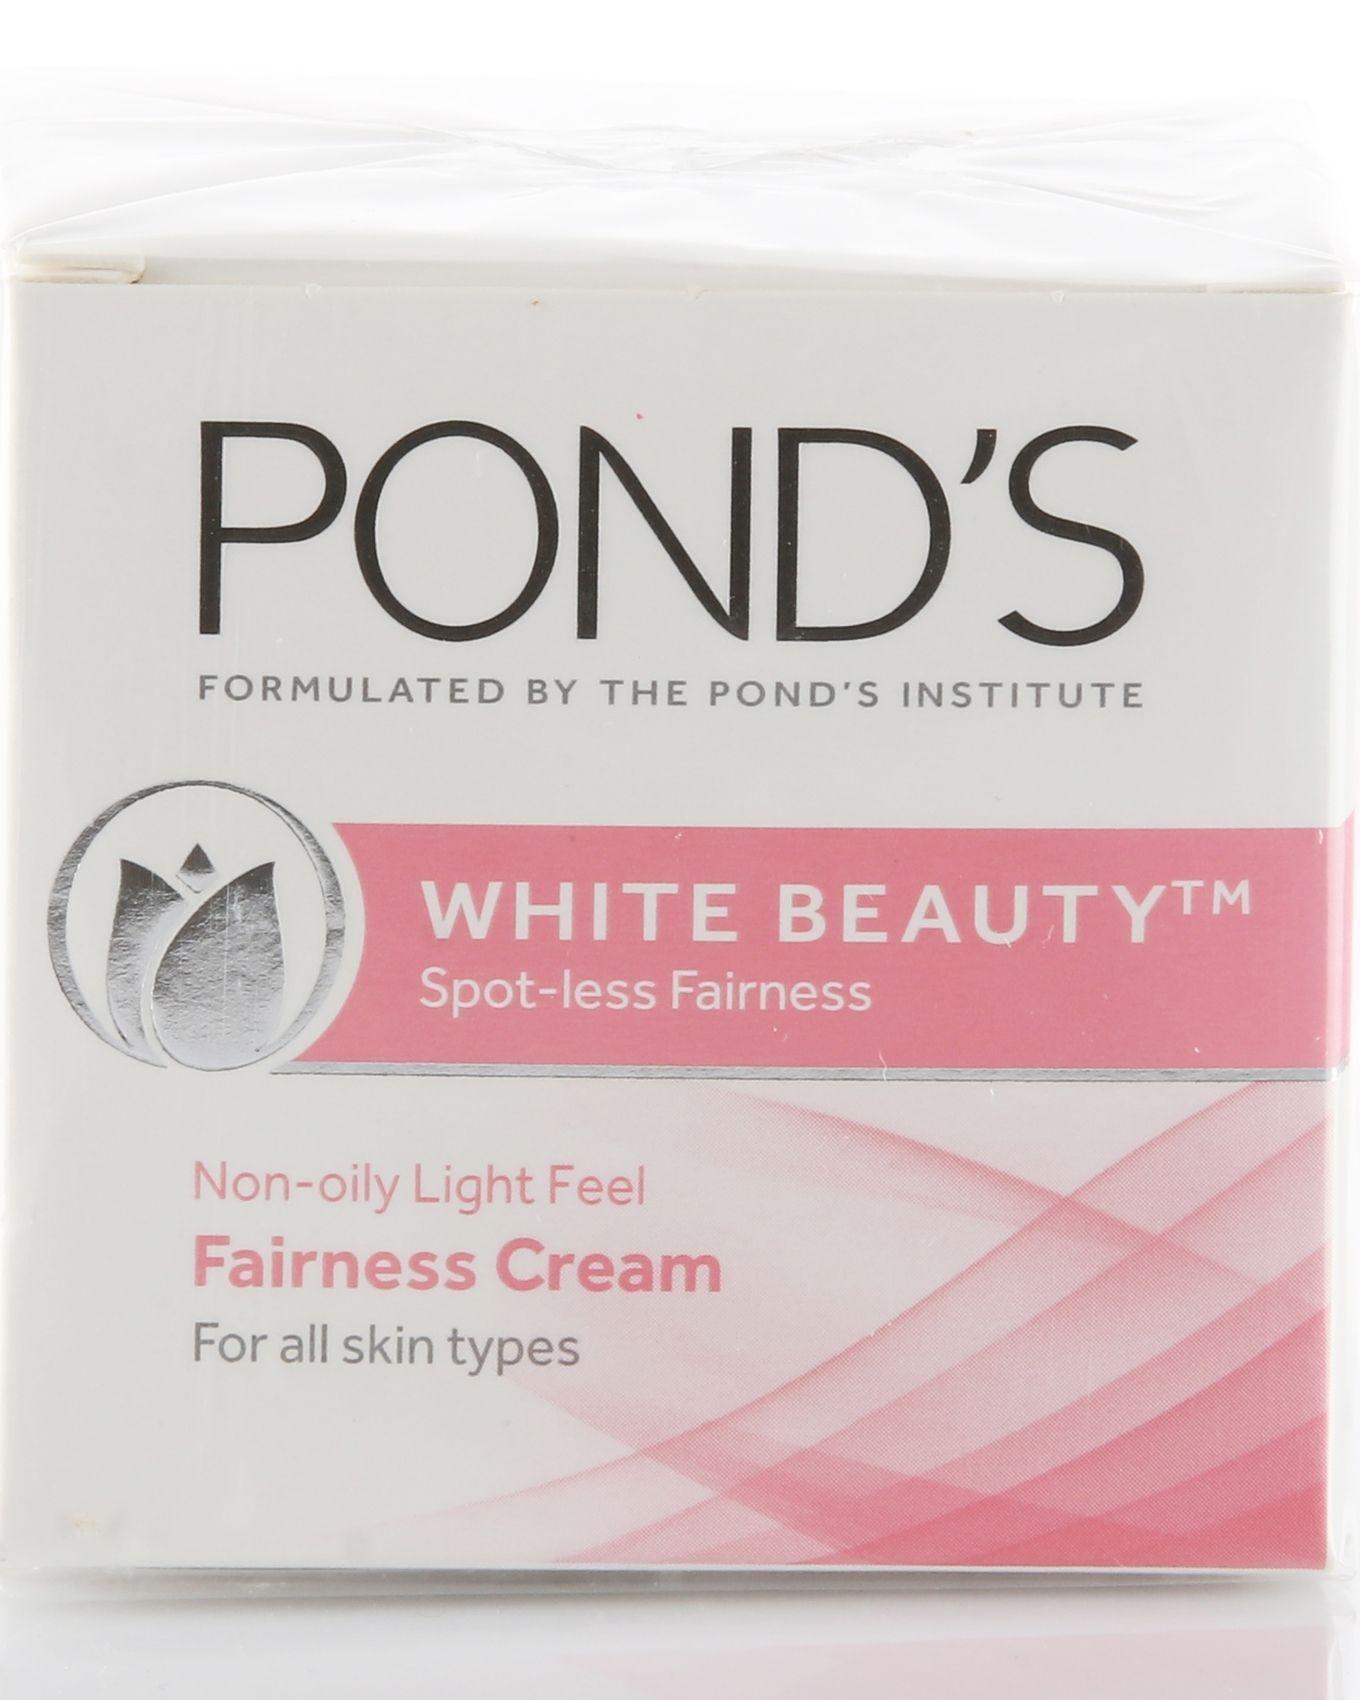 White Beauty™ Spot-less Fairness Cream 50g